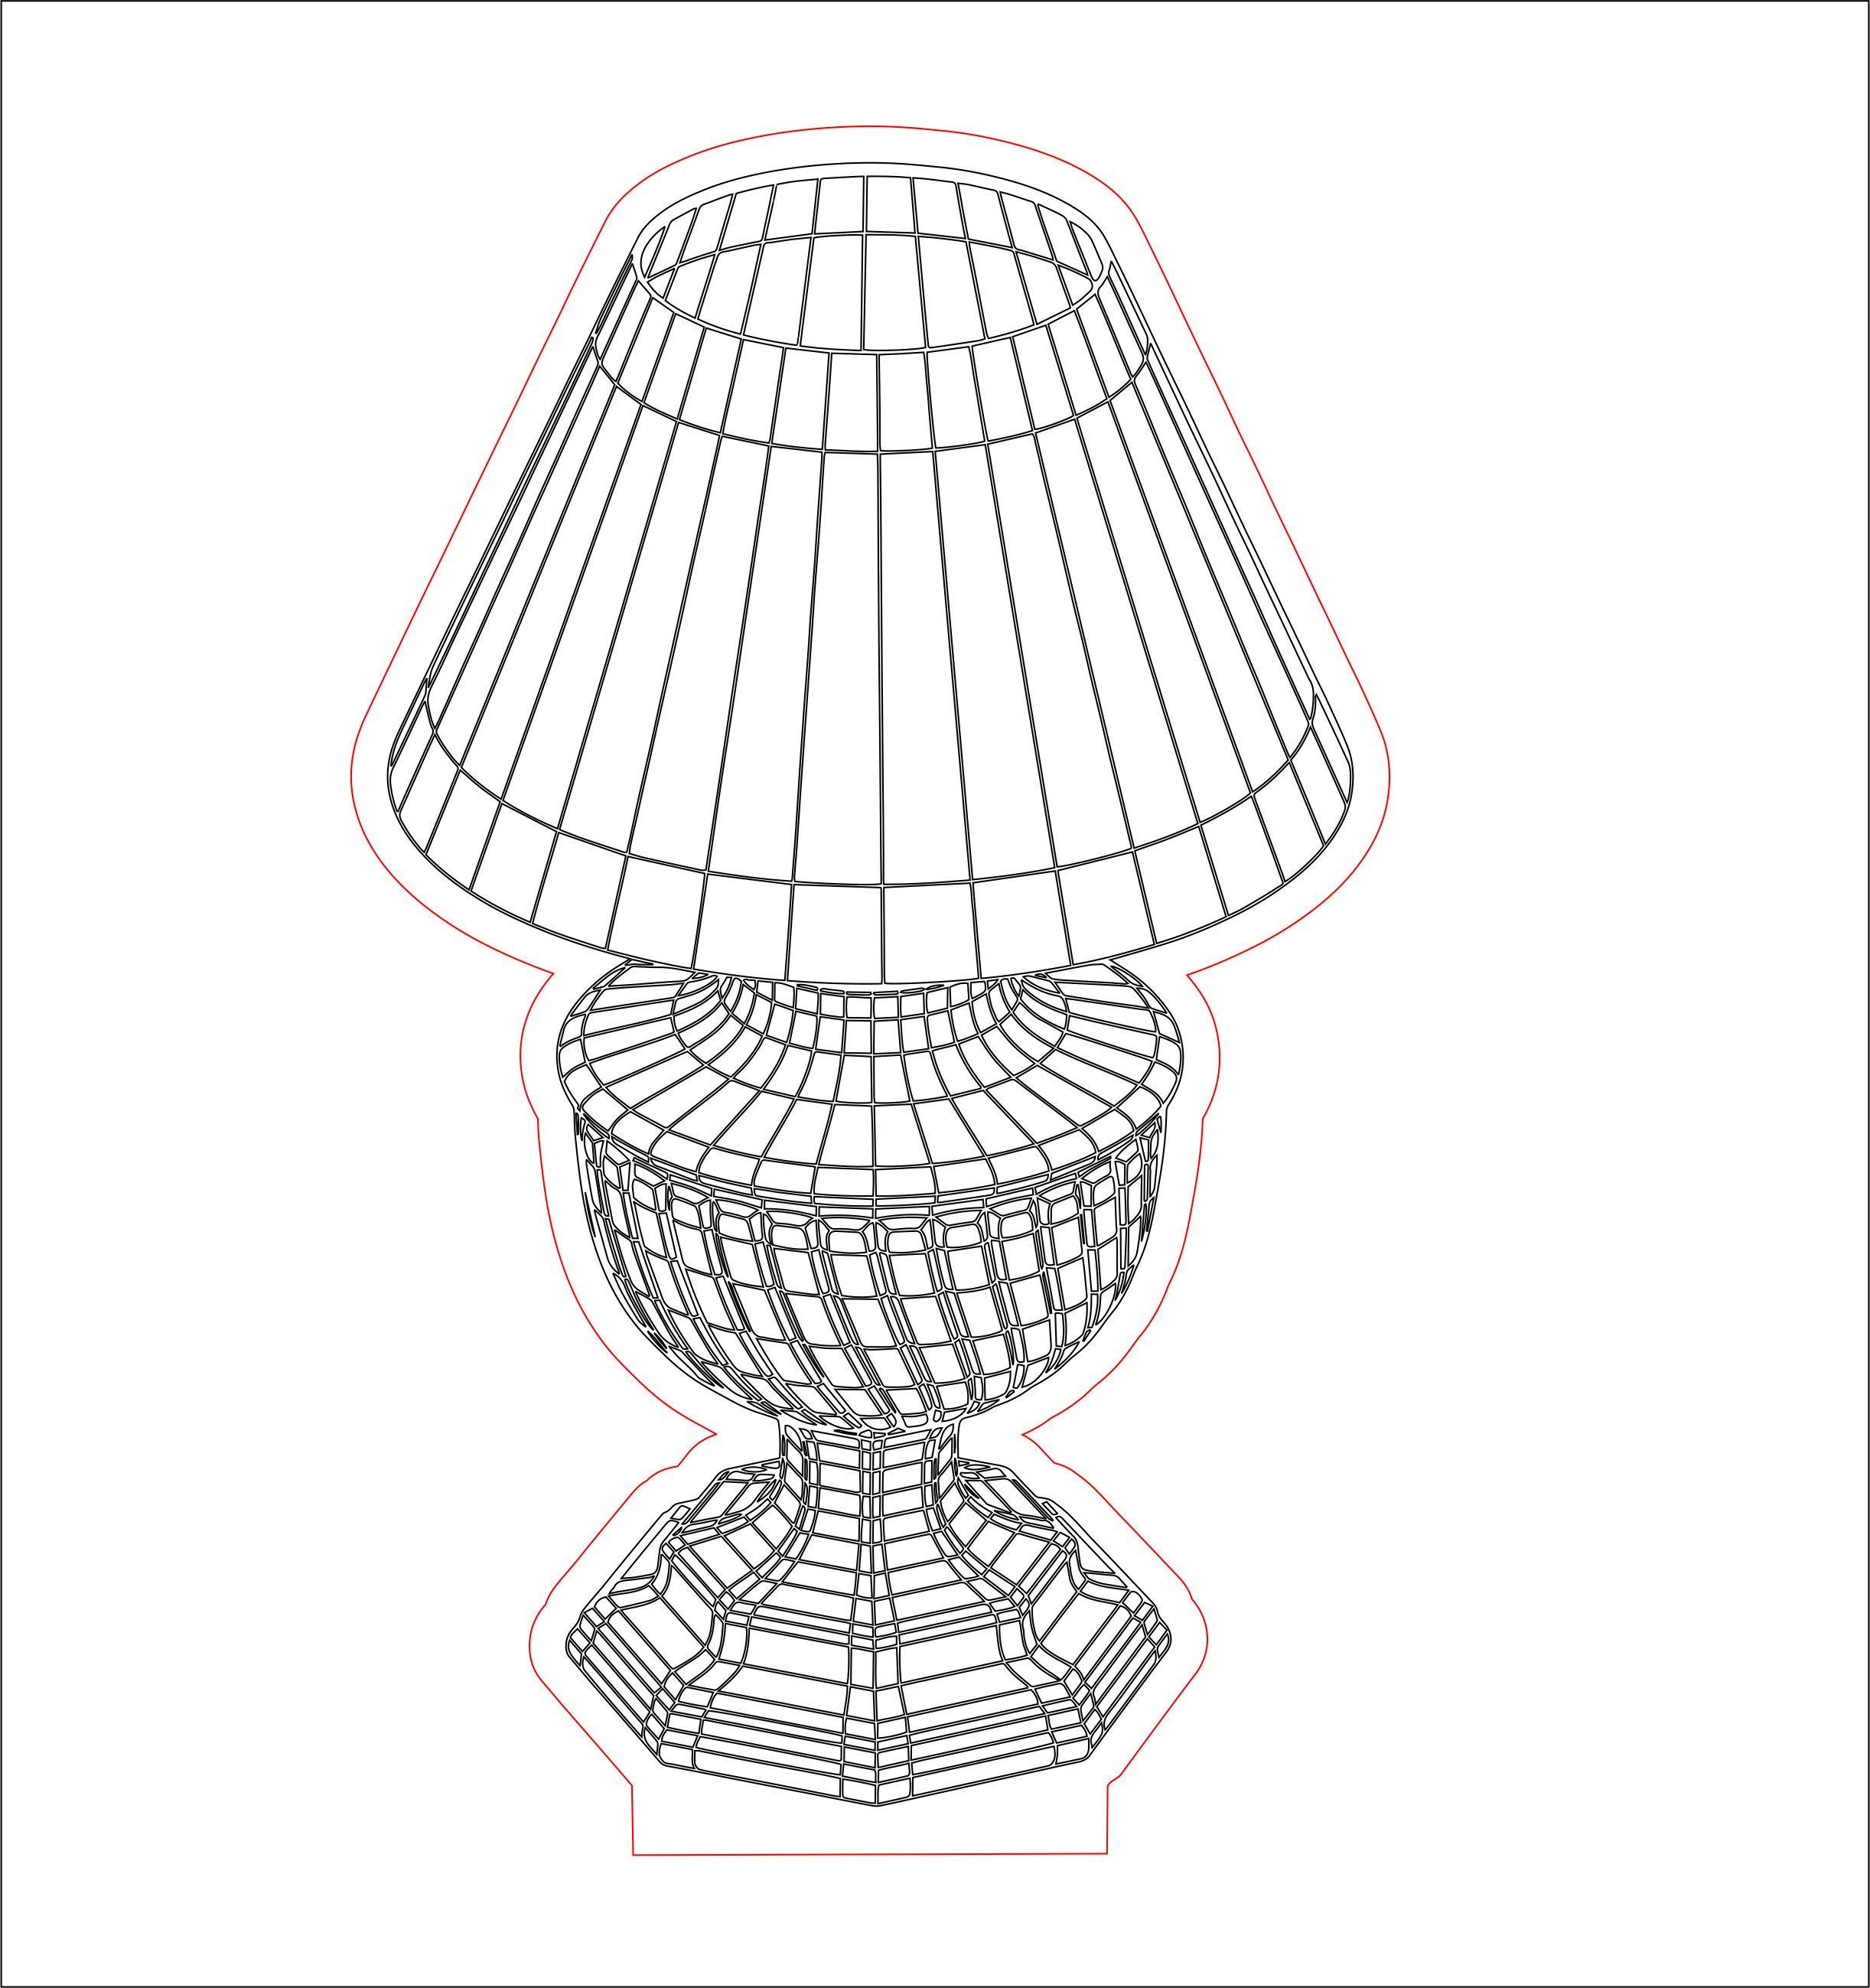 Lamp Shade3 3d Illusion Acrylic Led Lamp Vector Dxf Cdr Etsy In 2020 3d Illusions Lamp Illusions